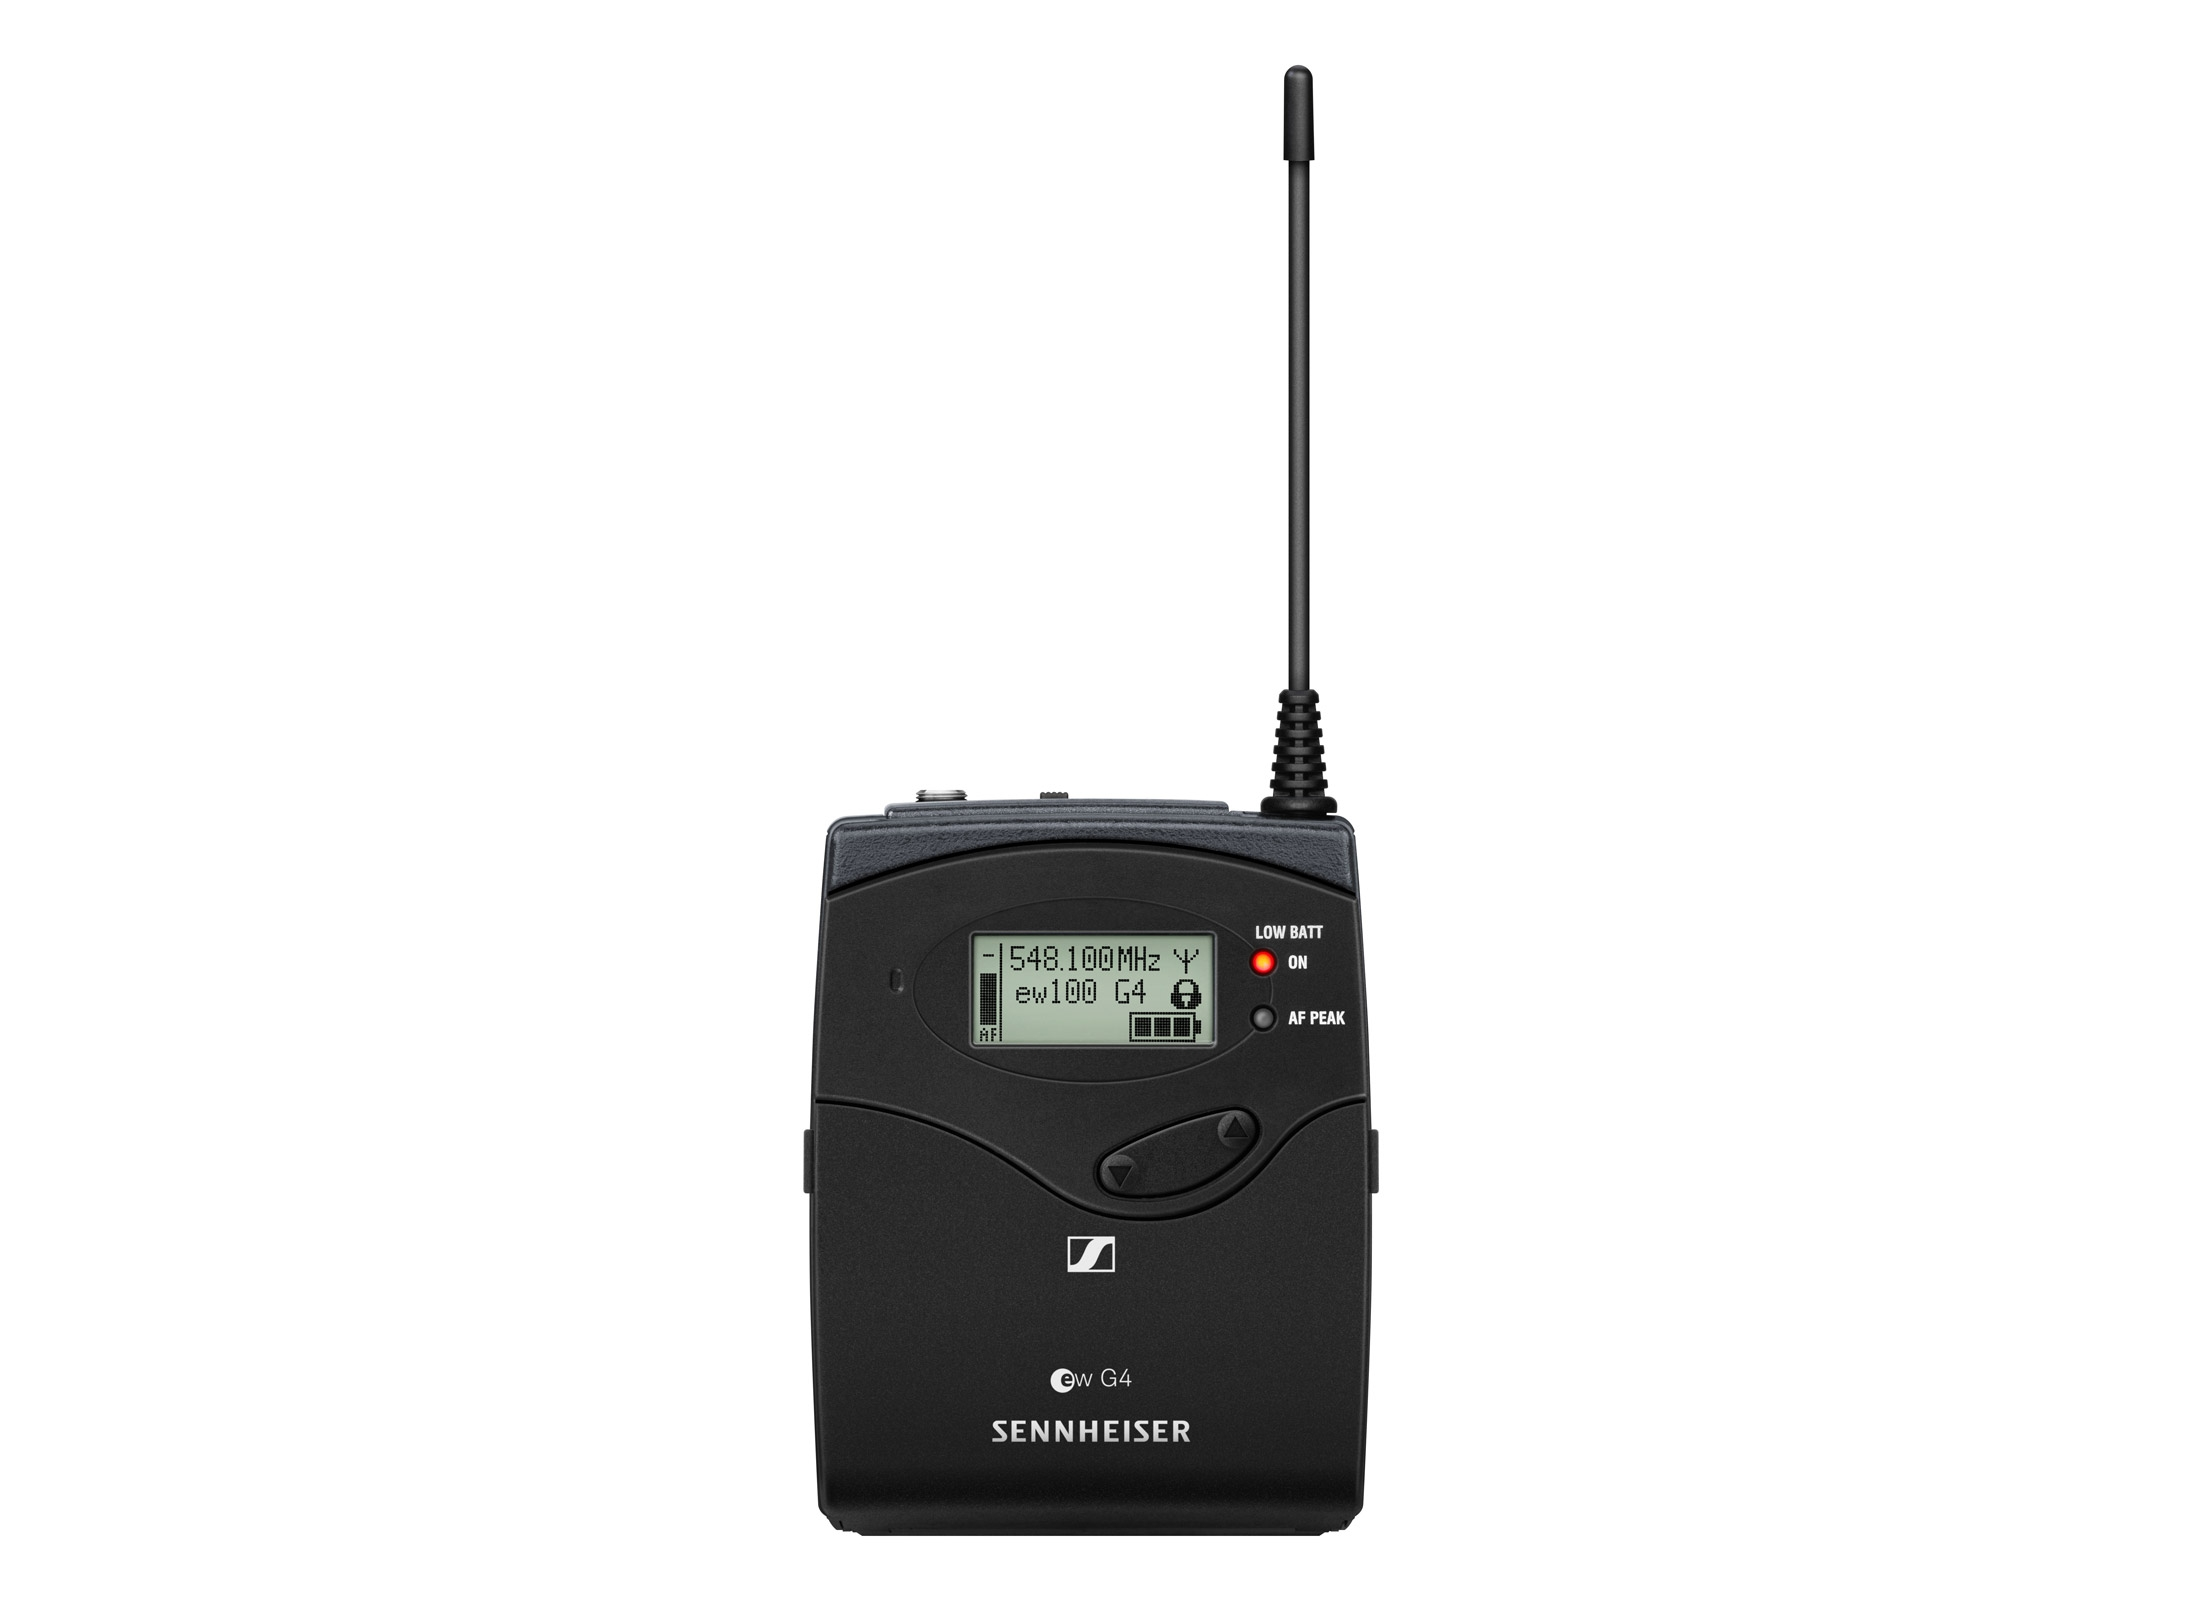 Sennheiser Ew 100 Ci1 G4 1g8 Wireless System Online At Low Prices Cl1 Wiring Diagram 2